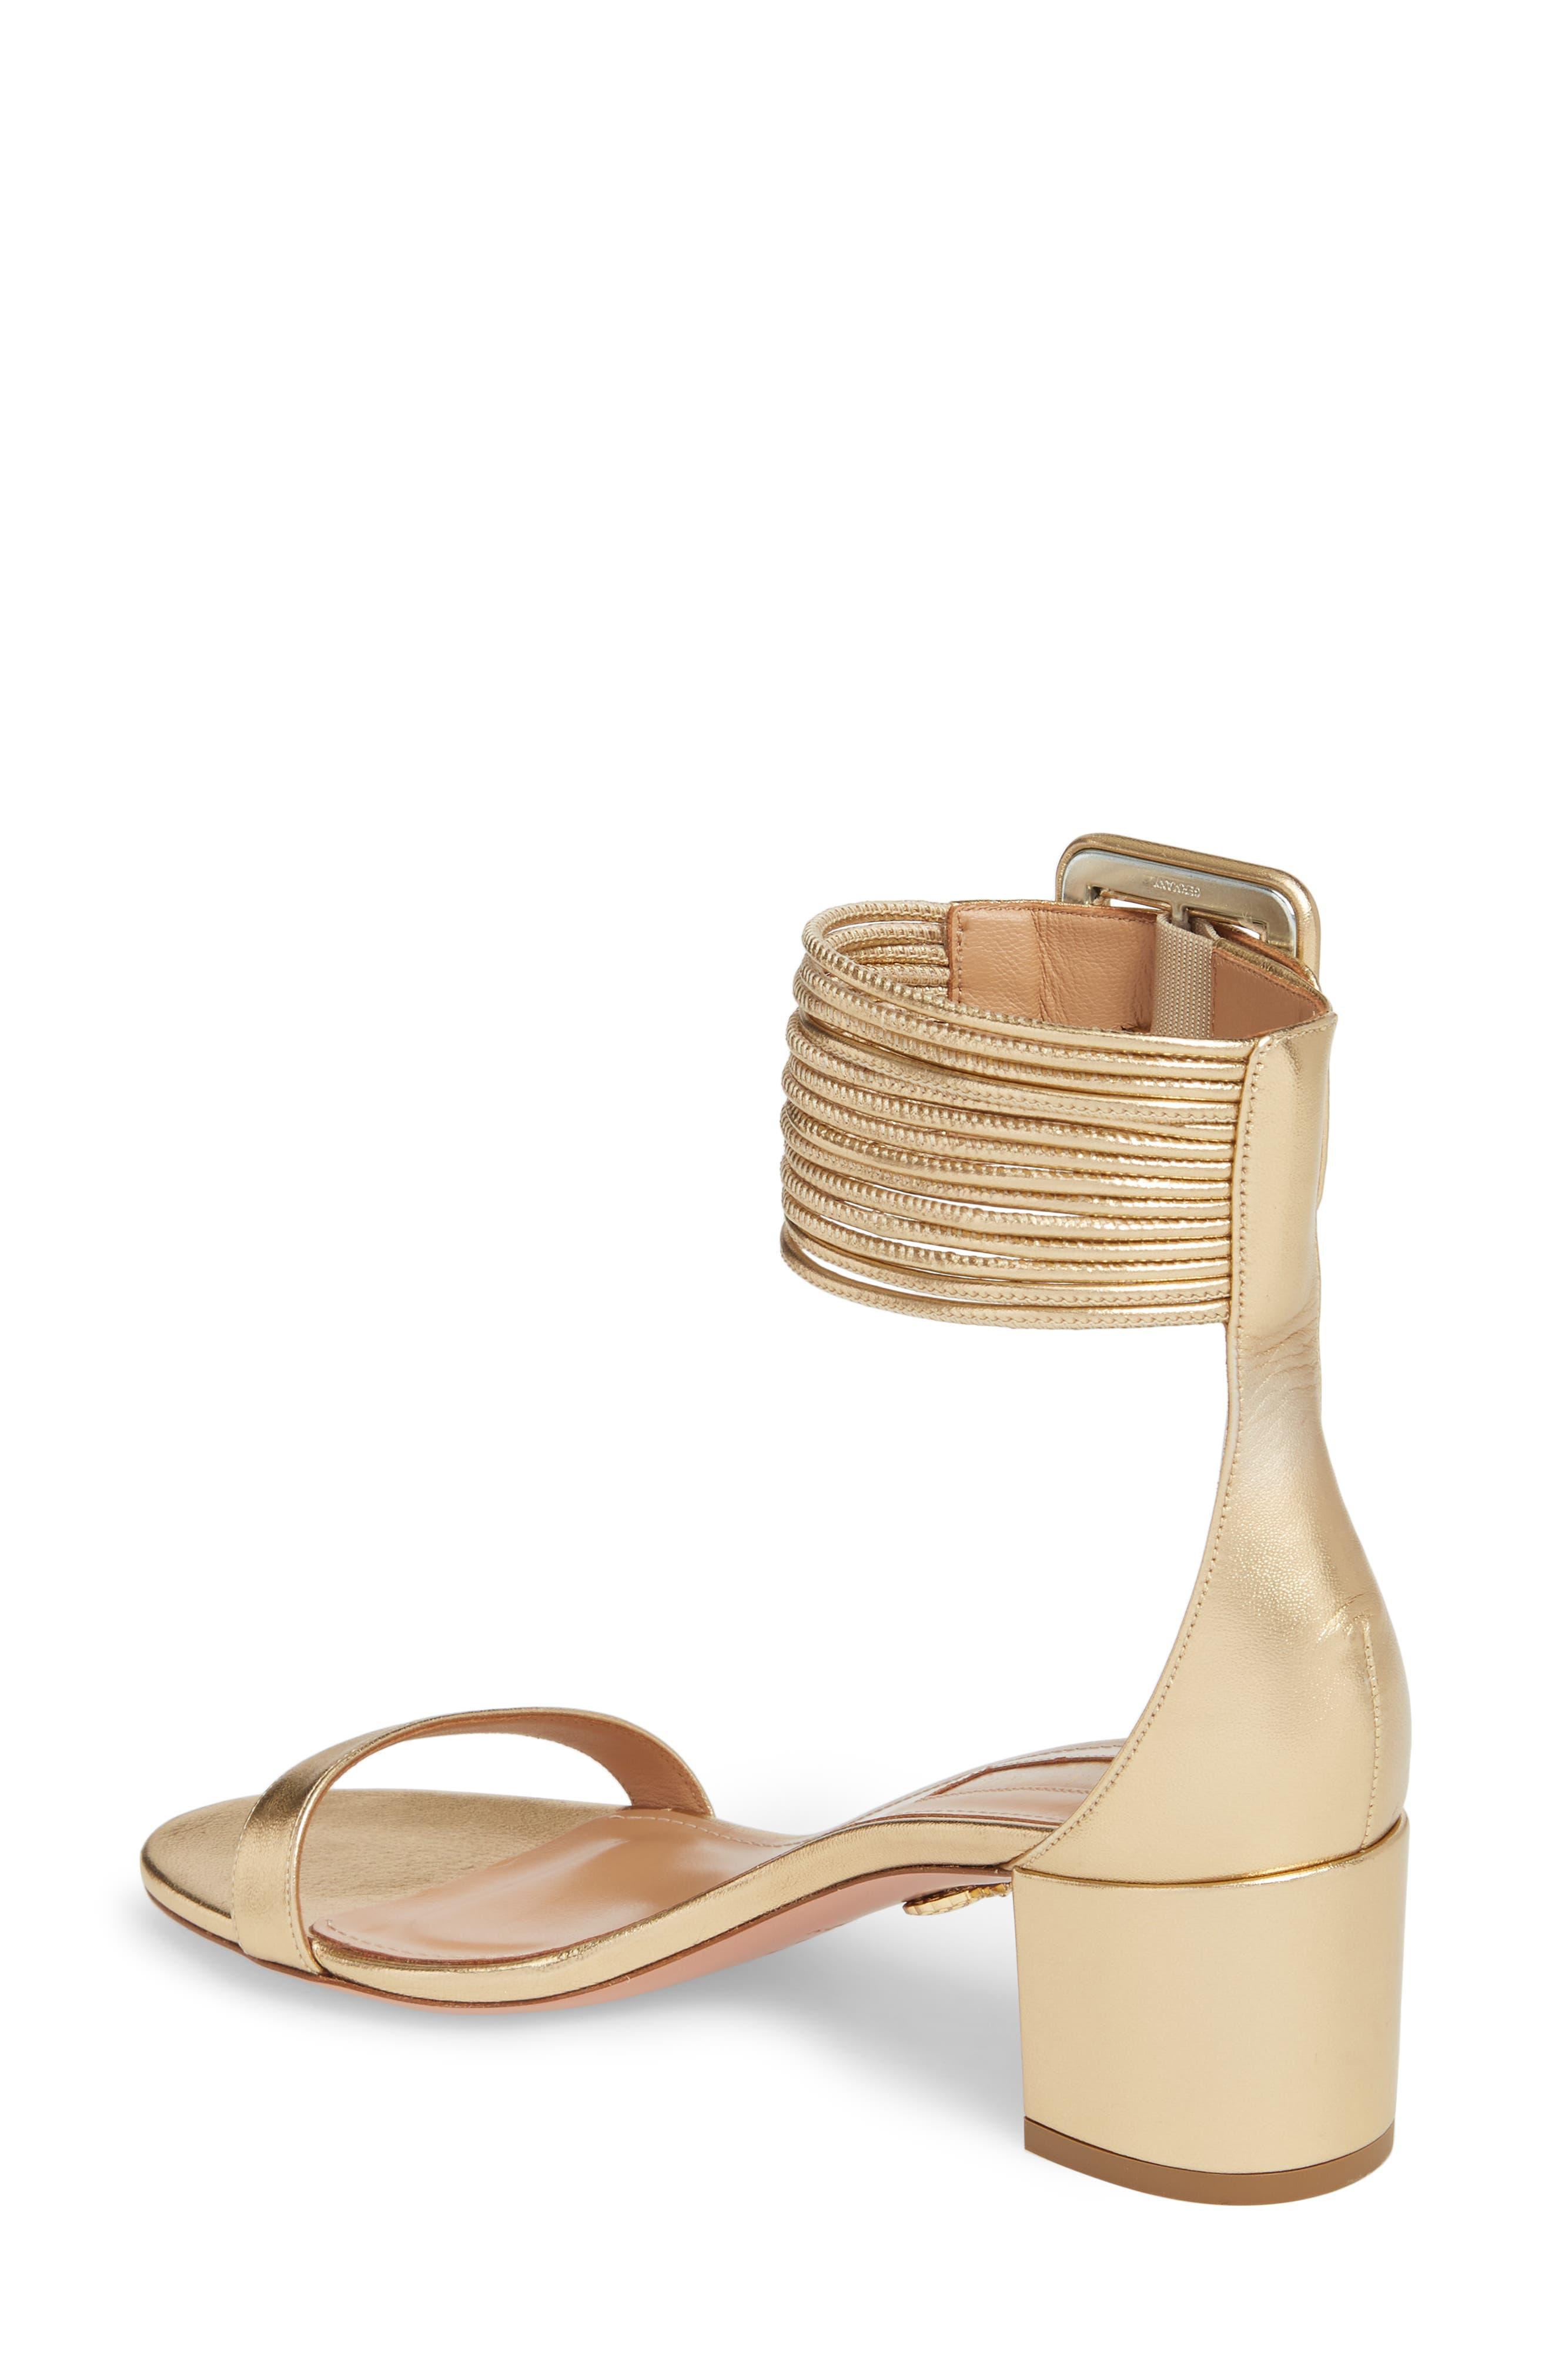 Casablanca Ankle Cuff Sandal,                             Alternate thumbnail 2, color,                             Soft Gold